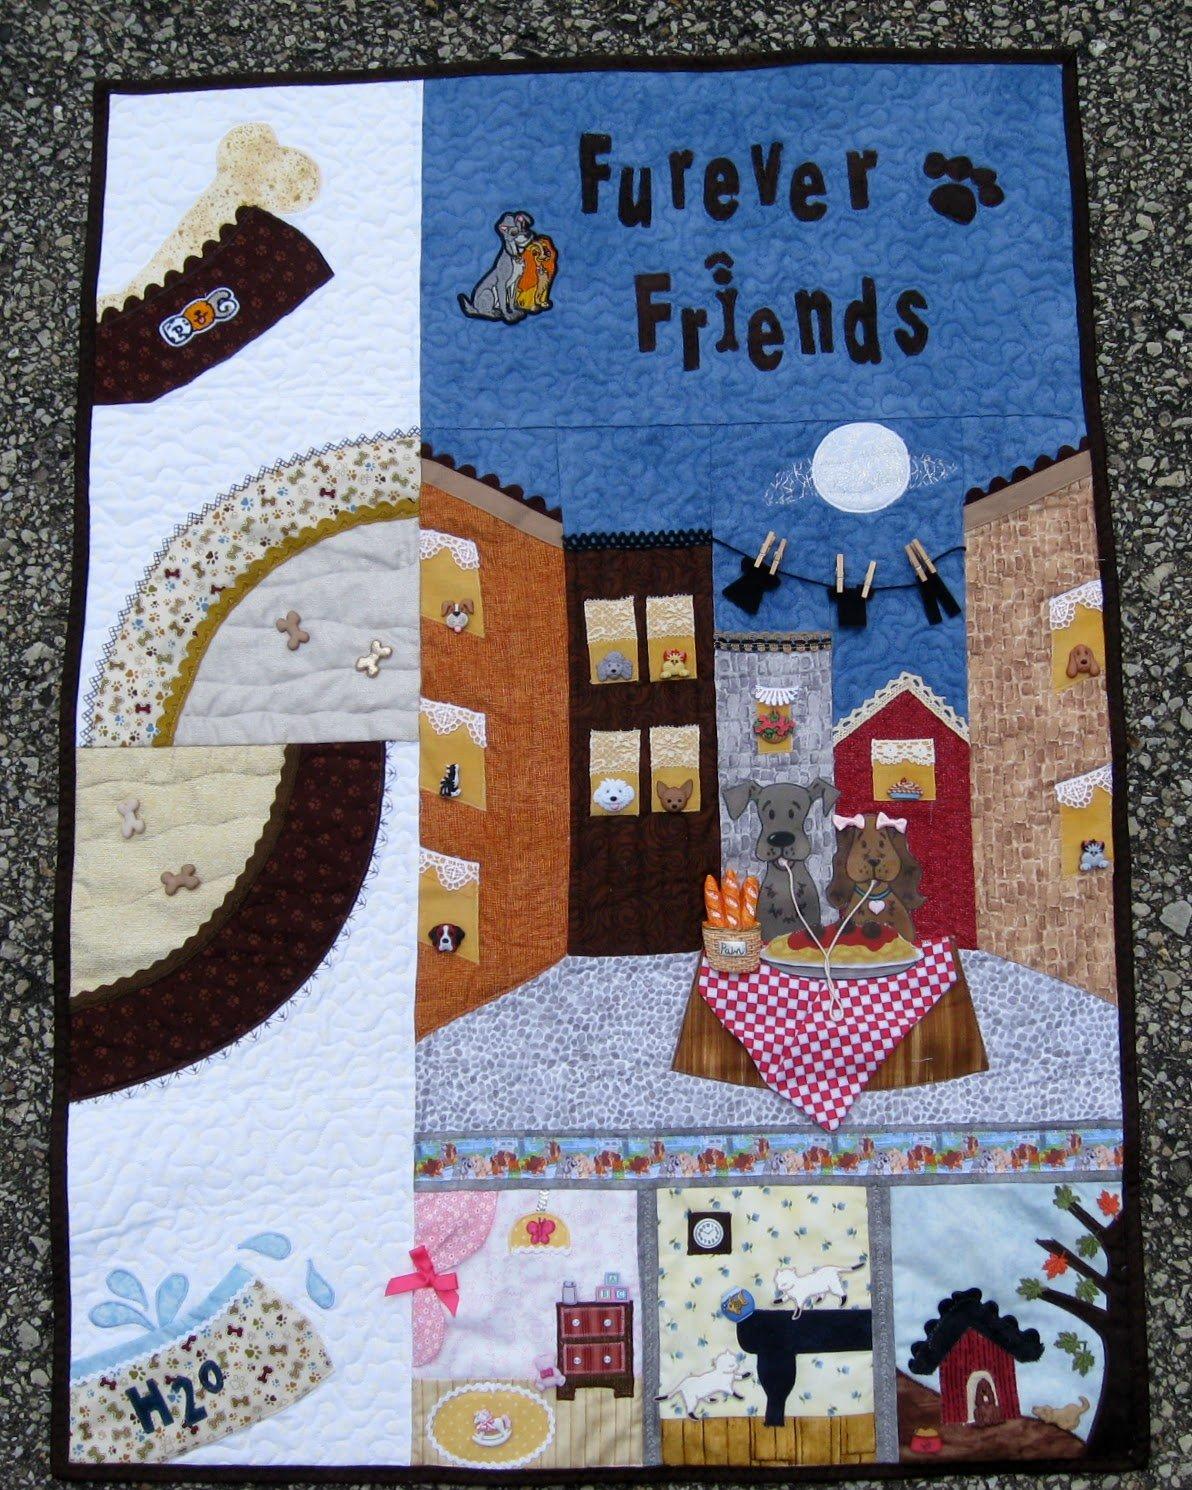 Taste Furever Friends 9th row add on